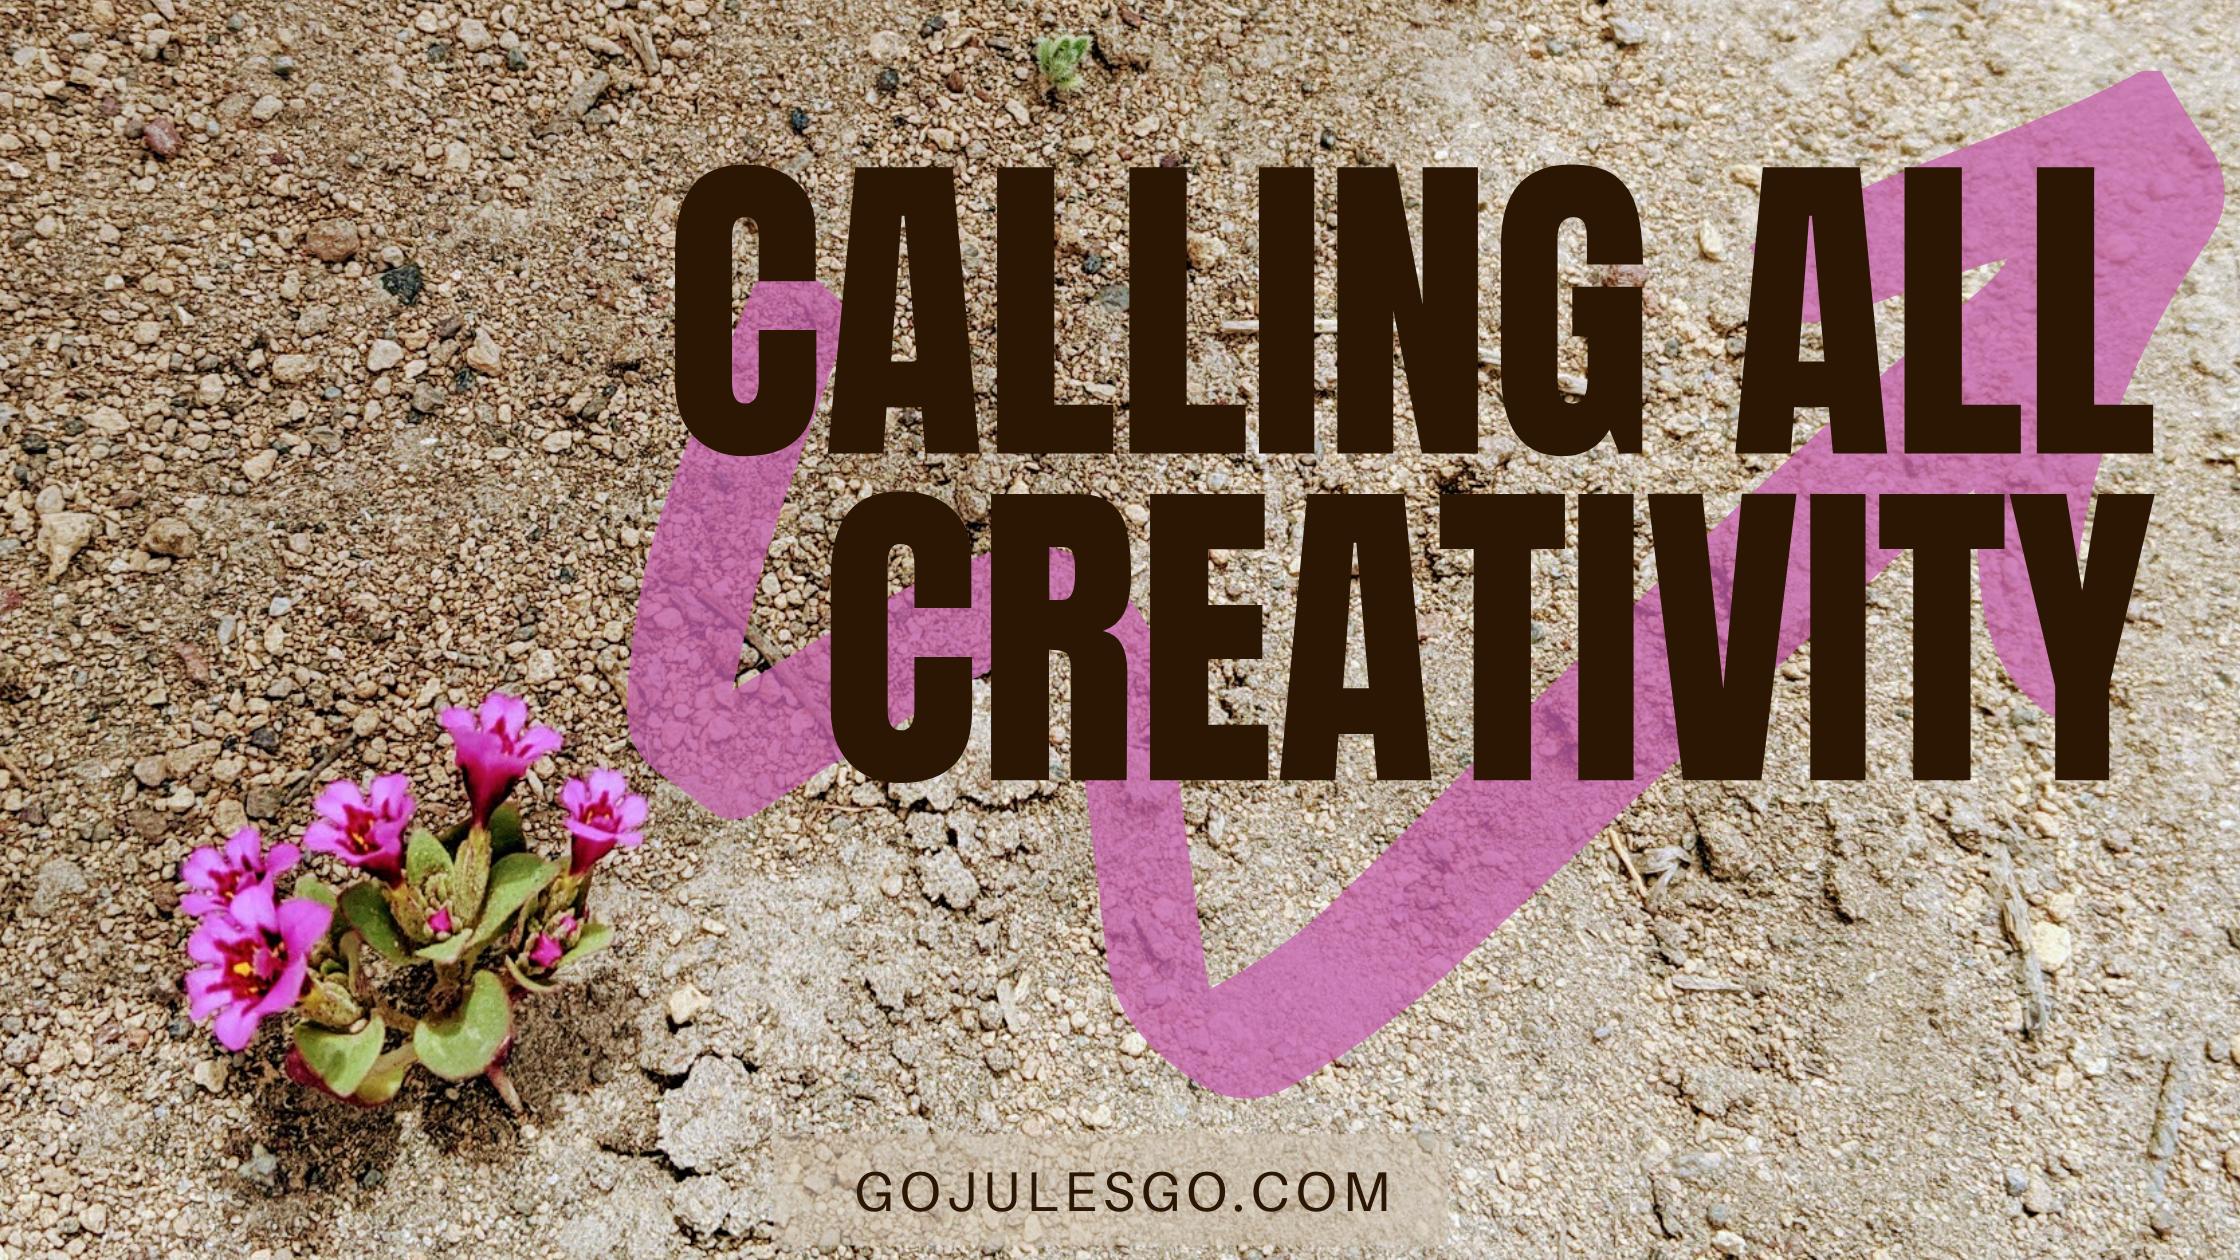 Go Jules Go title graphic Calling All Creativity_8JUL20